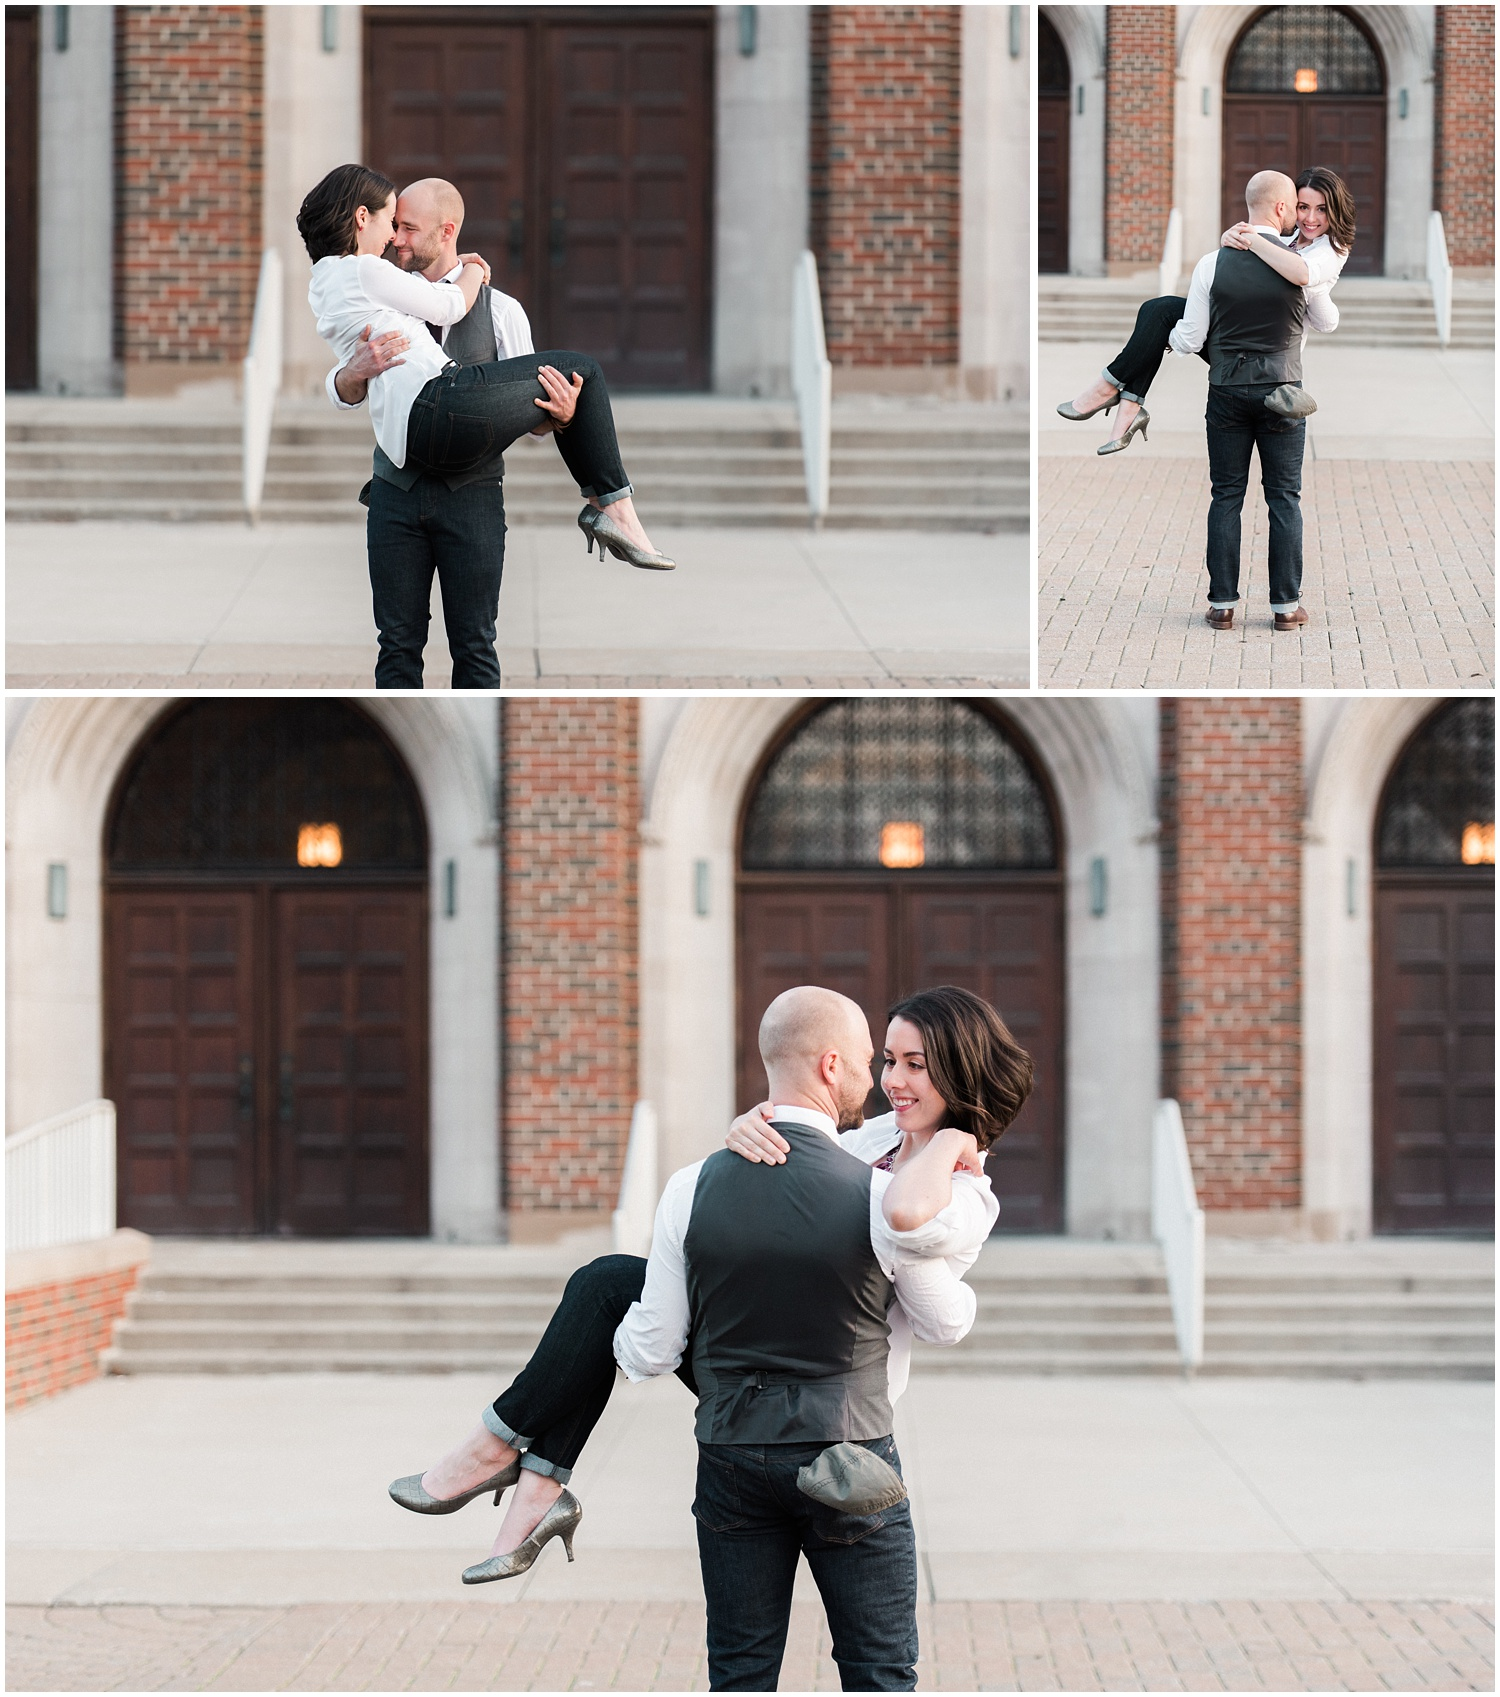 Aimee Thomas _Midwest Ohio Photographer_Engagement Session_0025.jpg